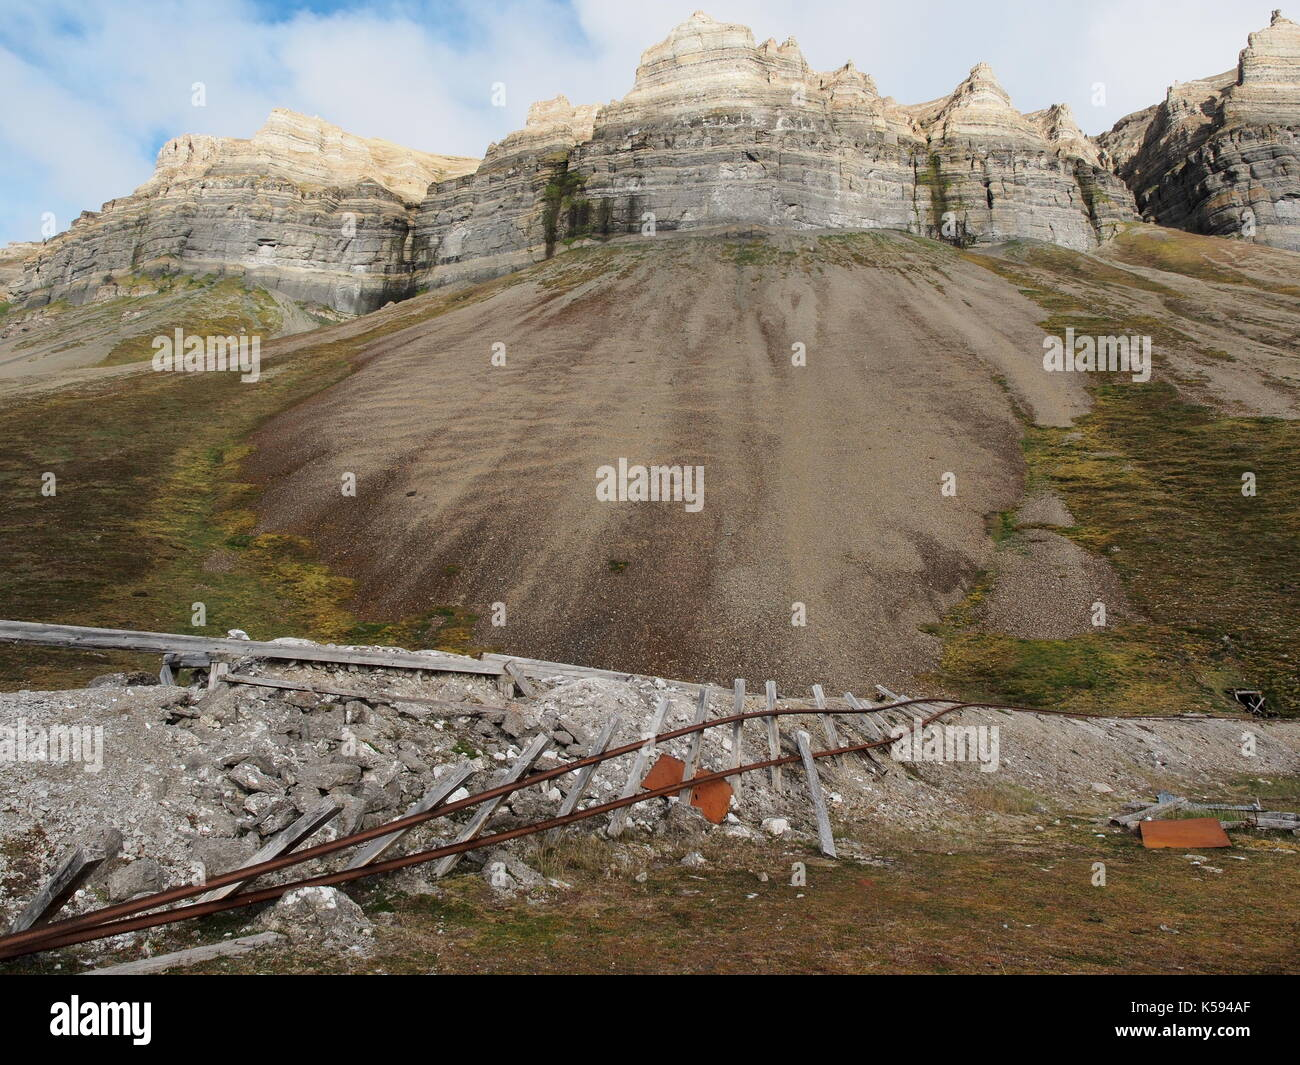 Mining remains, Skansbukta,  Svalbard, Norway - Stock Image